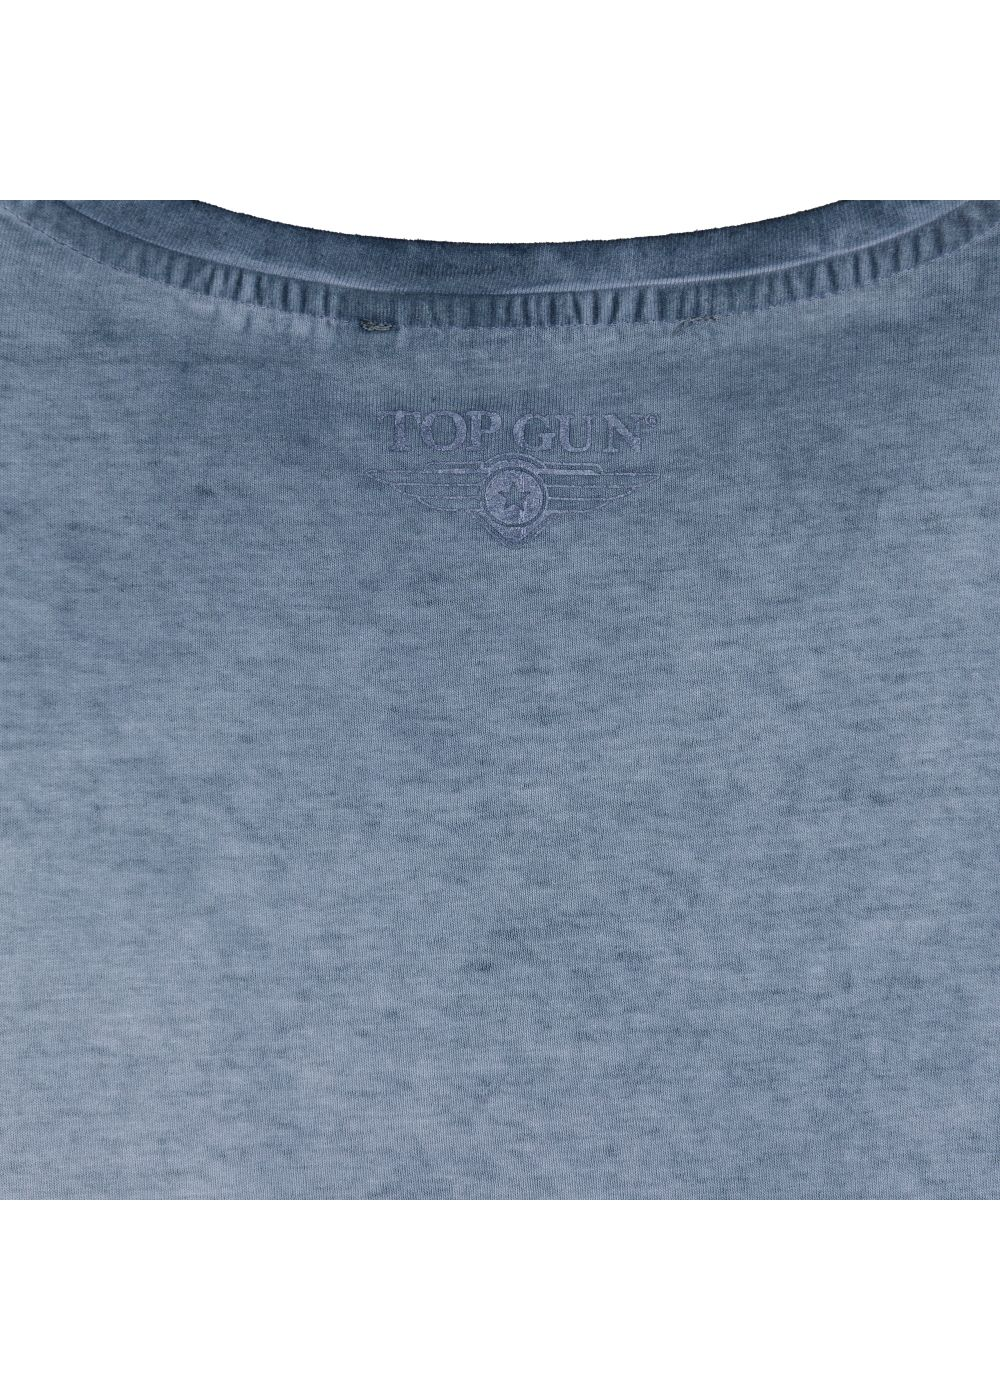 T-shirt męski TSHMT-0053-69(Z21)